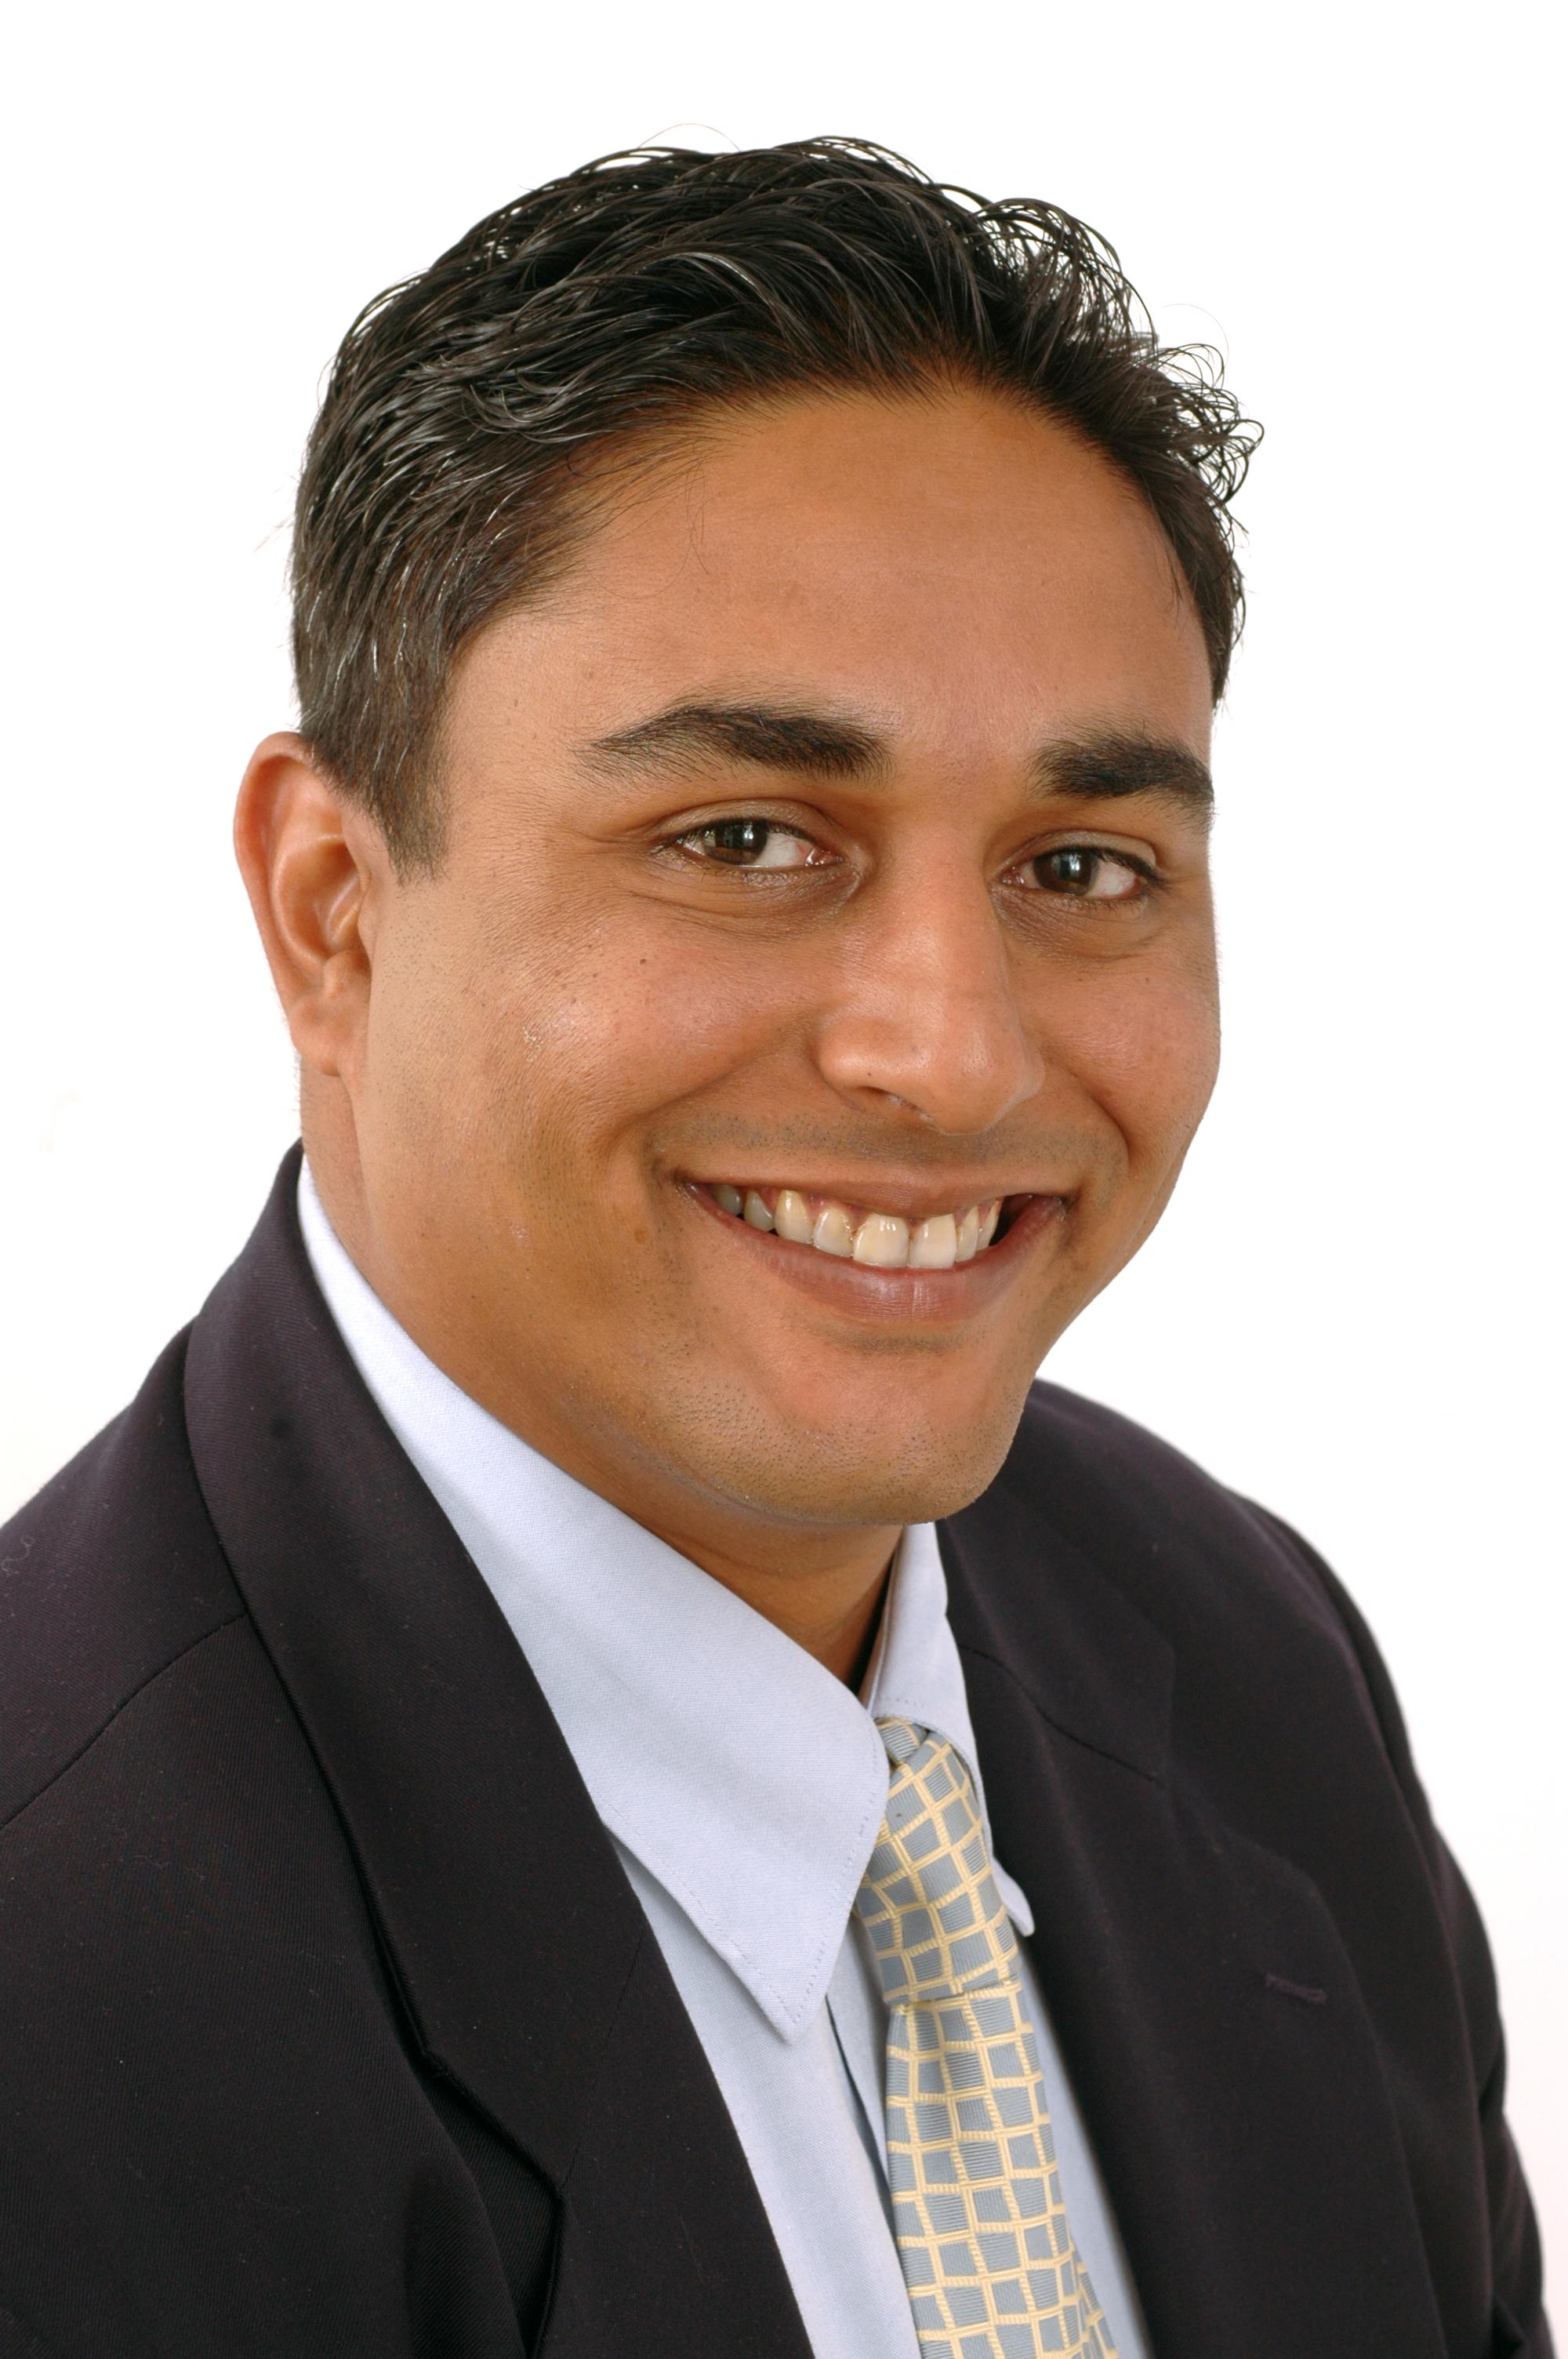 ishan palit leitet gesch ftsbereich product service bei t v s d pressemitteilung t v s d ag. Black Bedroom Furniture Sets. Home Design Ideas